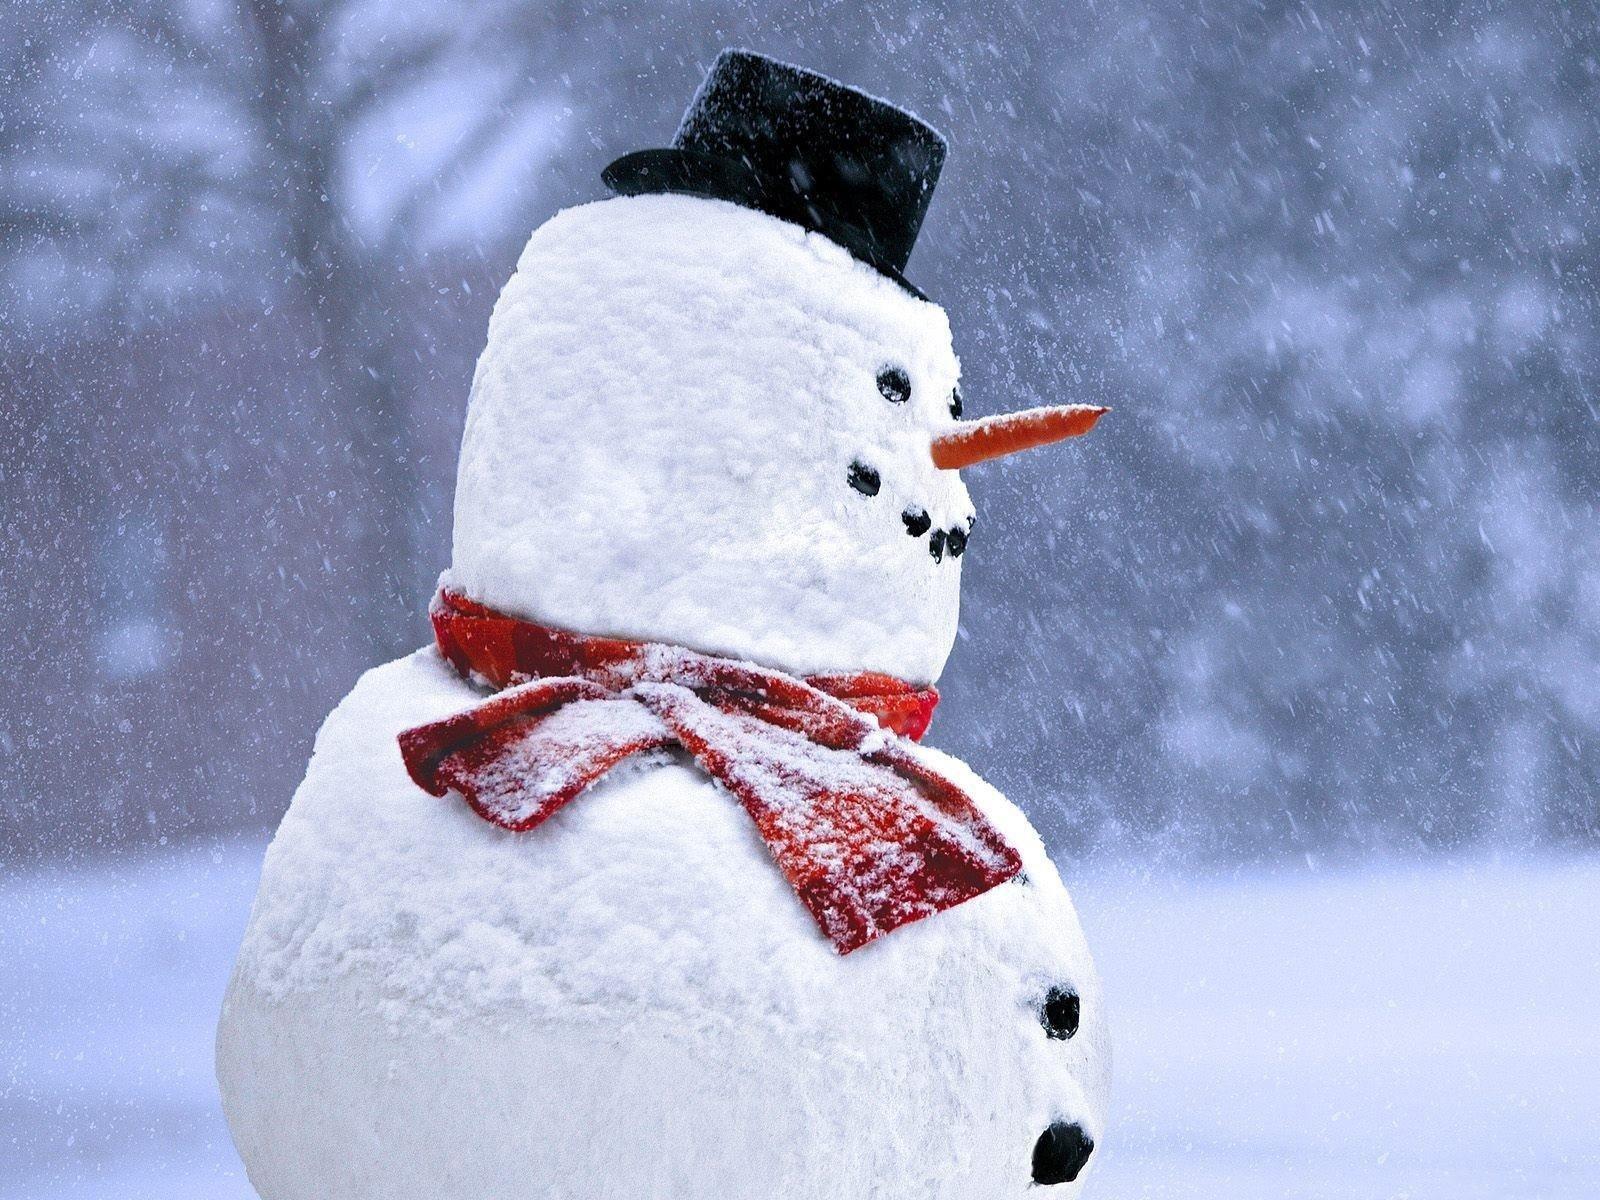 забывайте, что снеговик на аву картинки предназначена для